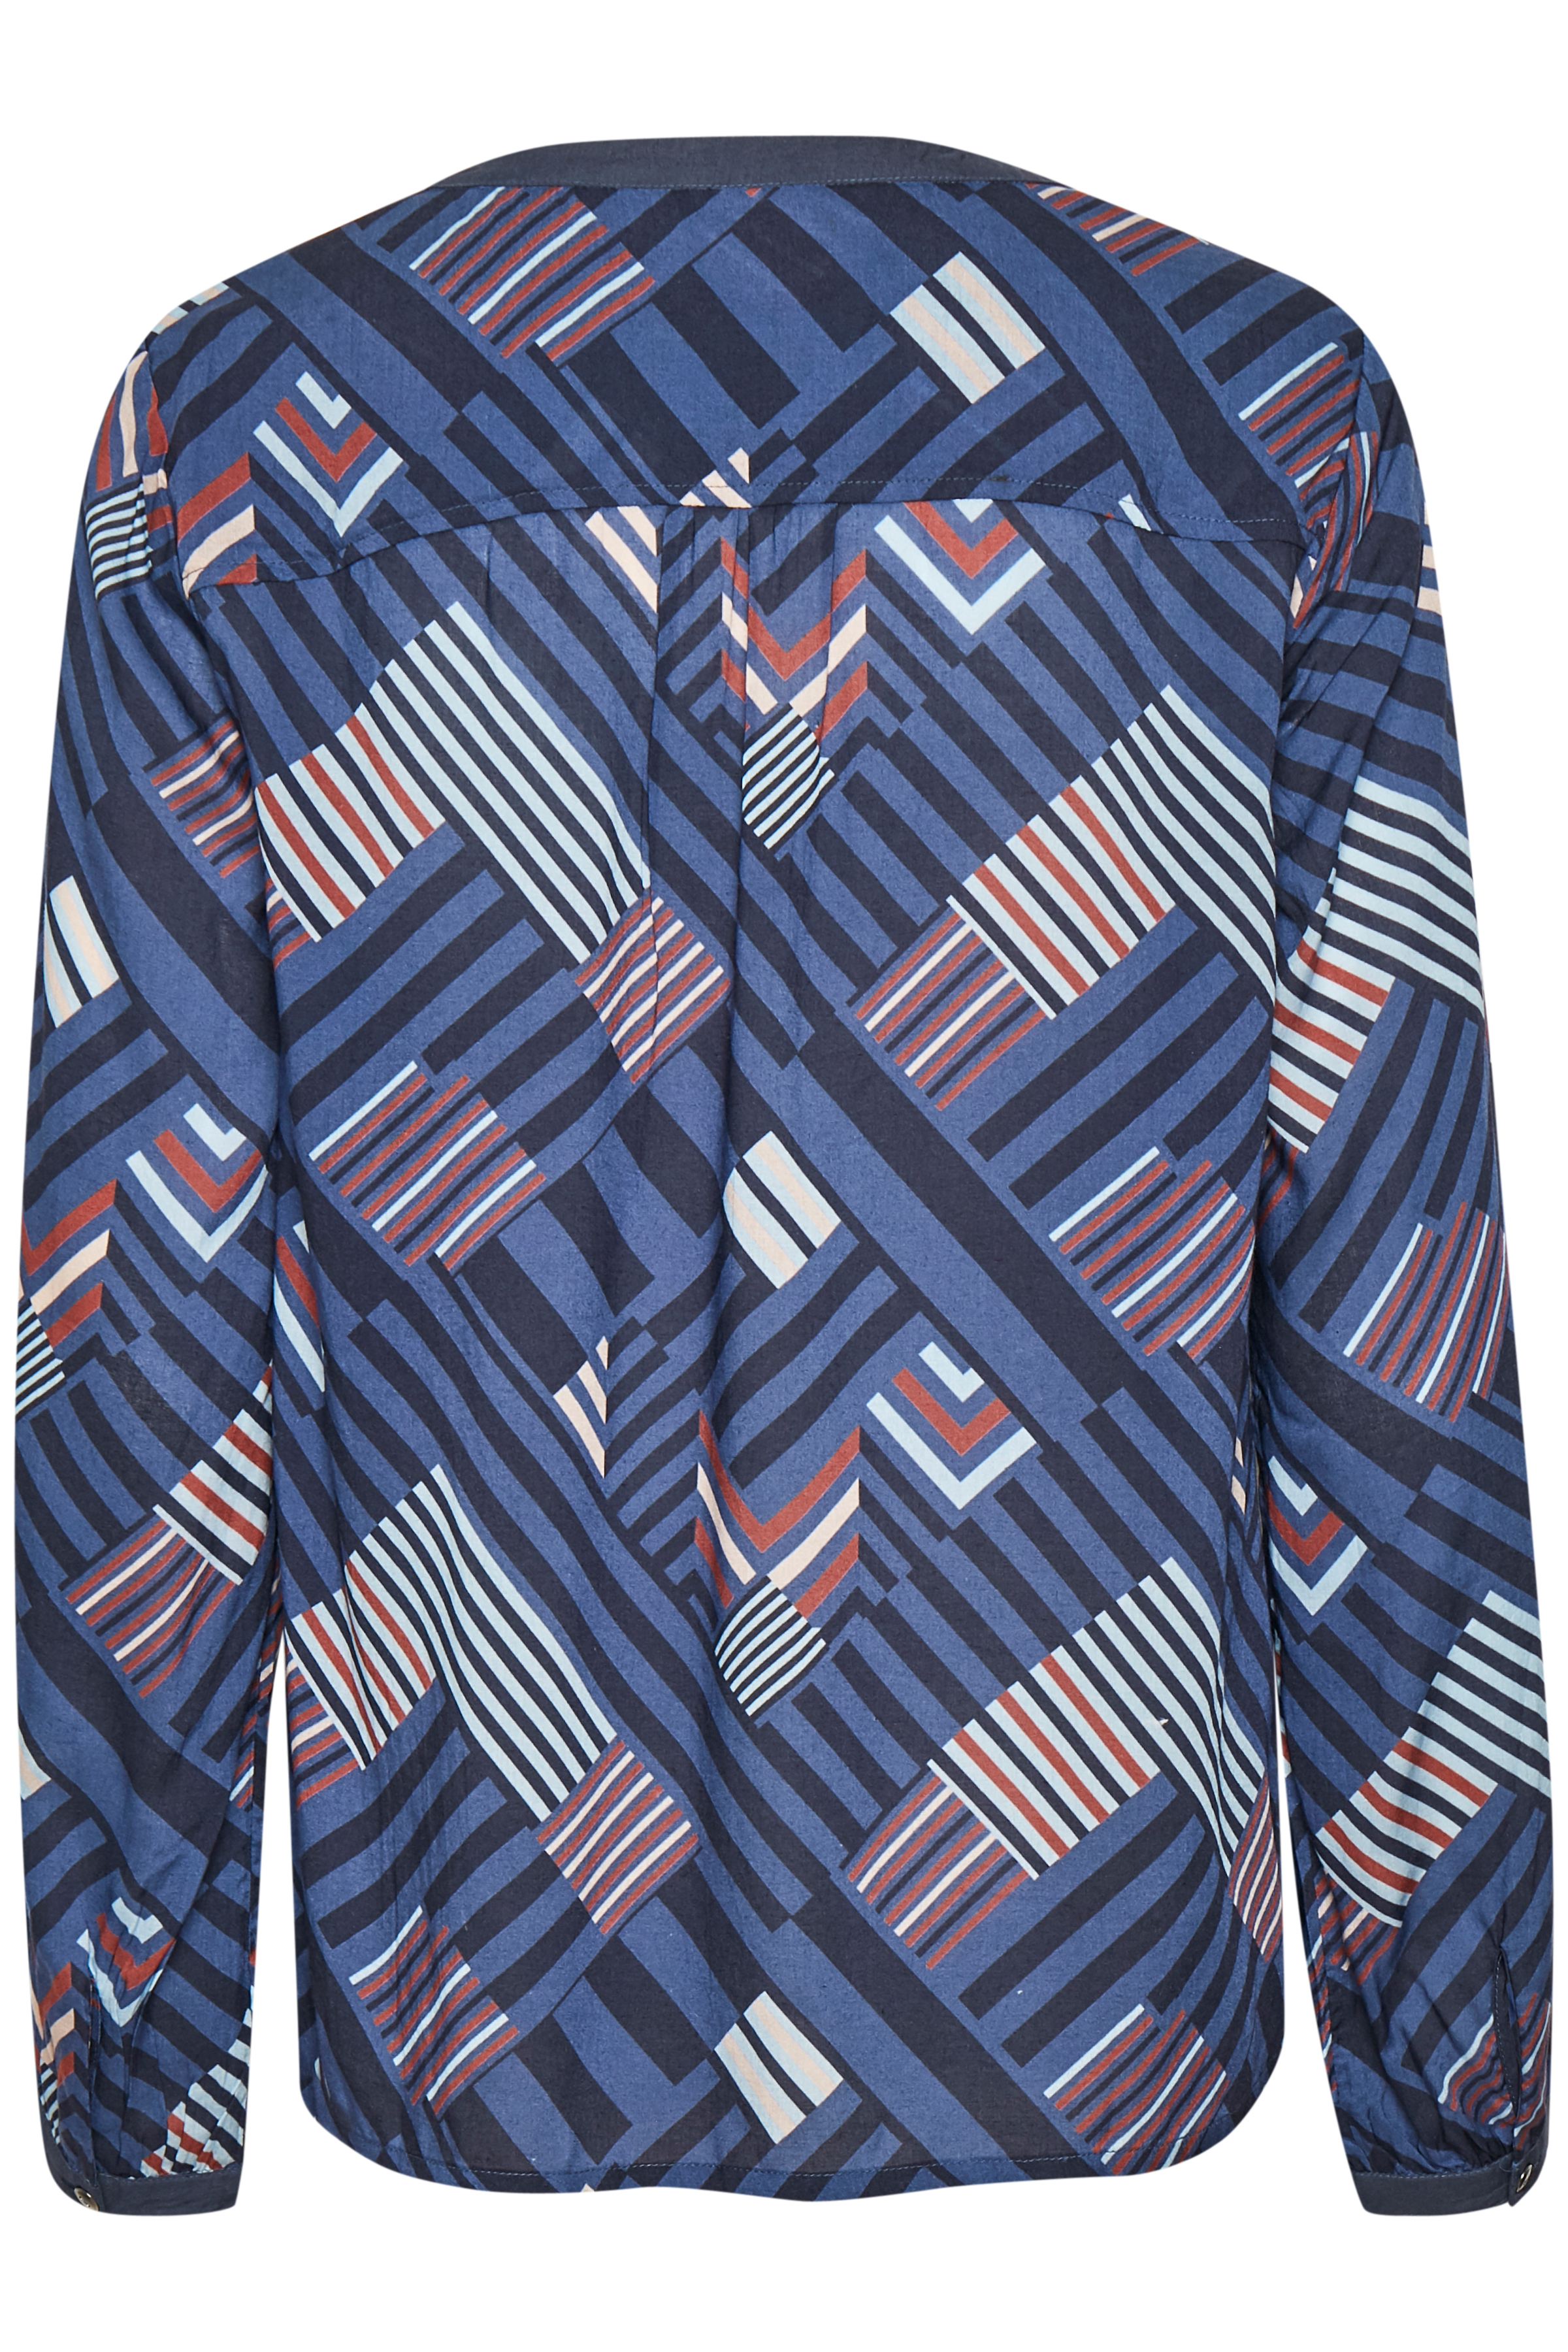 Marineblau/braun Langarm-Bluse von Cream – Shoppen Sie Marineblau/braun Langarm-Bluse ab Gr. 34-46 hier